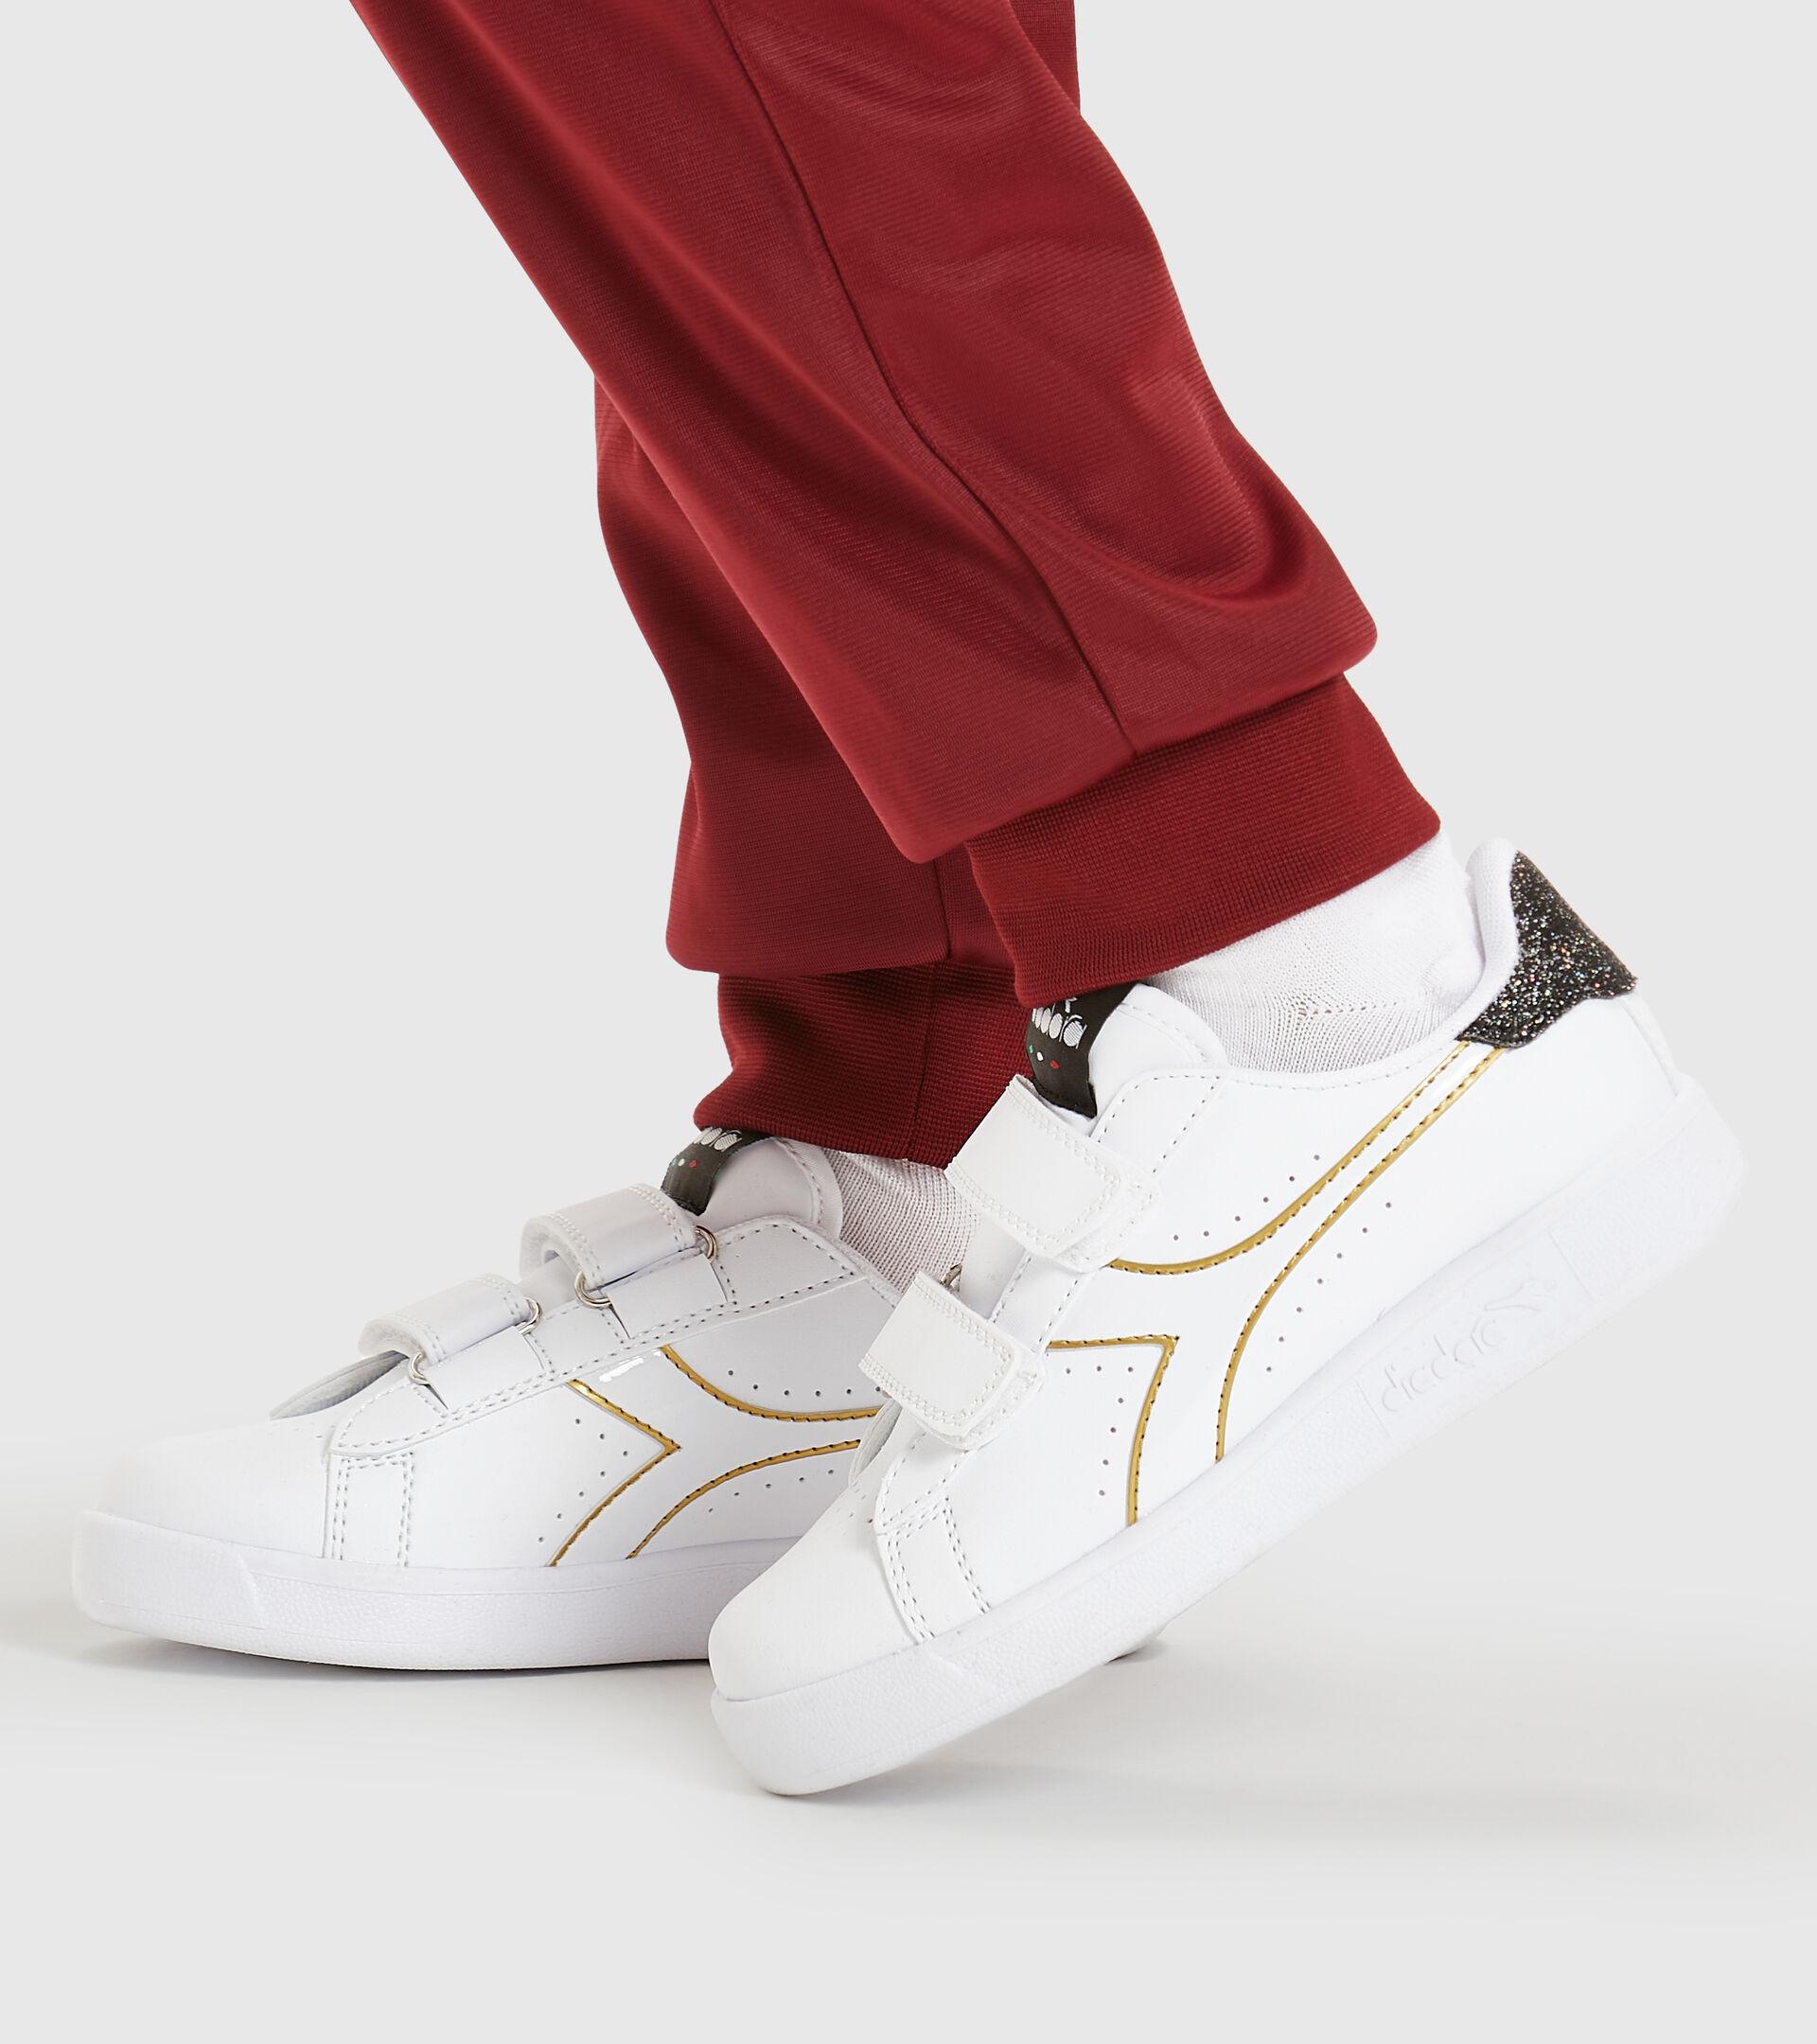 Chaussures de sport - Enfants 4-8 ans GAME P PS GIRL BIANCO/NERO/ORO - Diadora